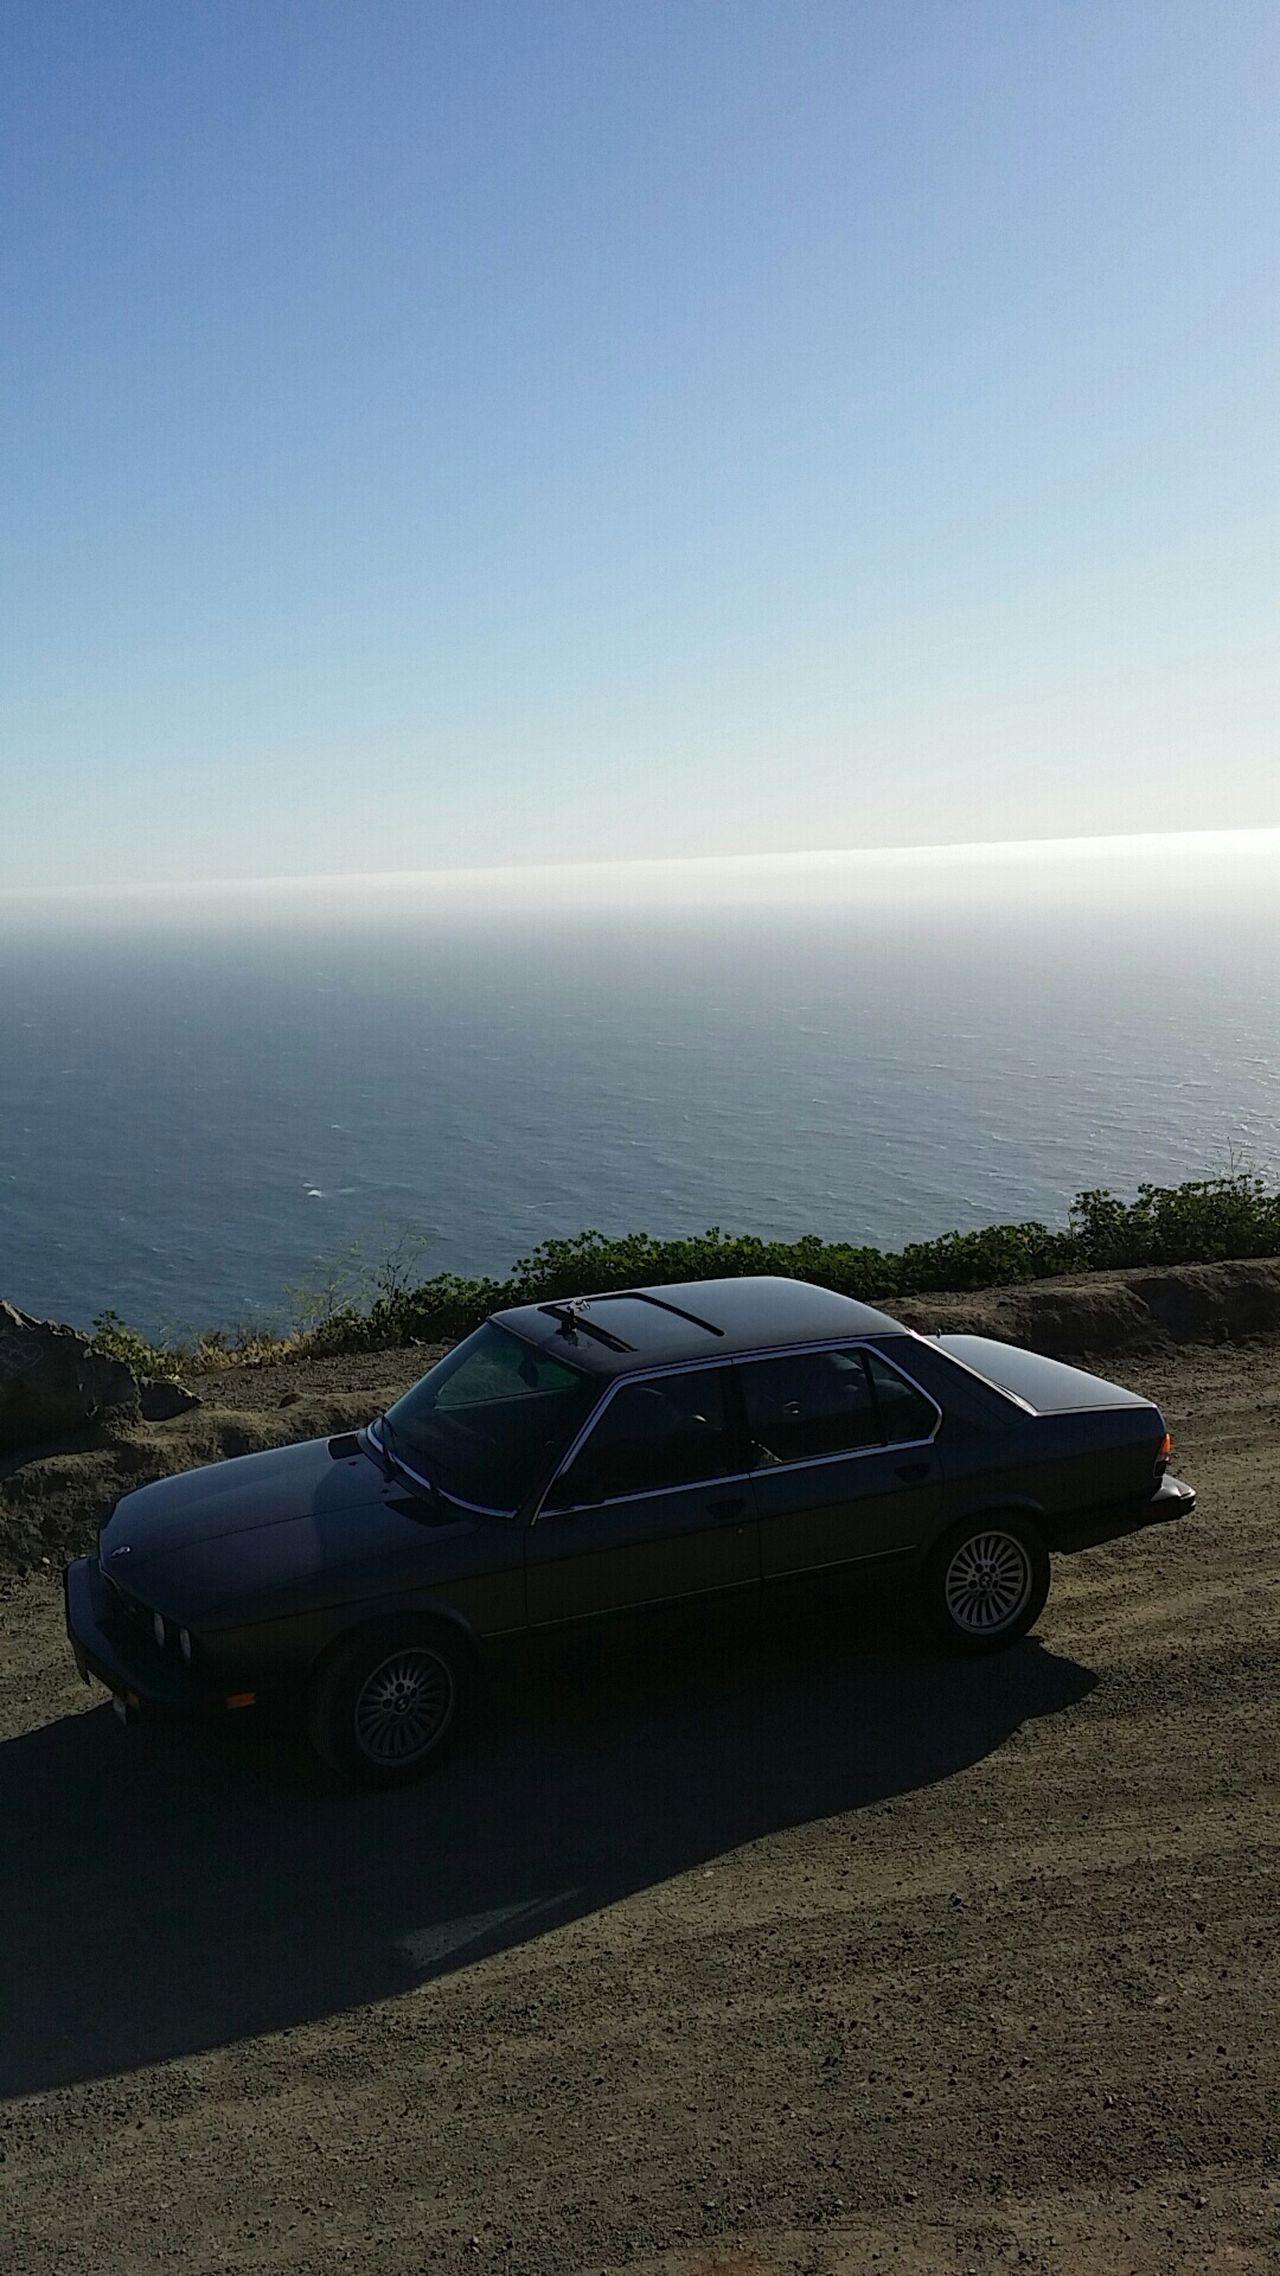 Epic Roadtrip E28 Bmw California